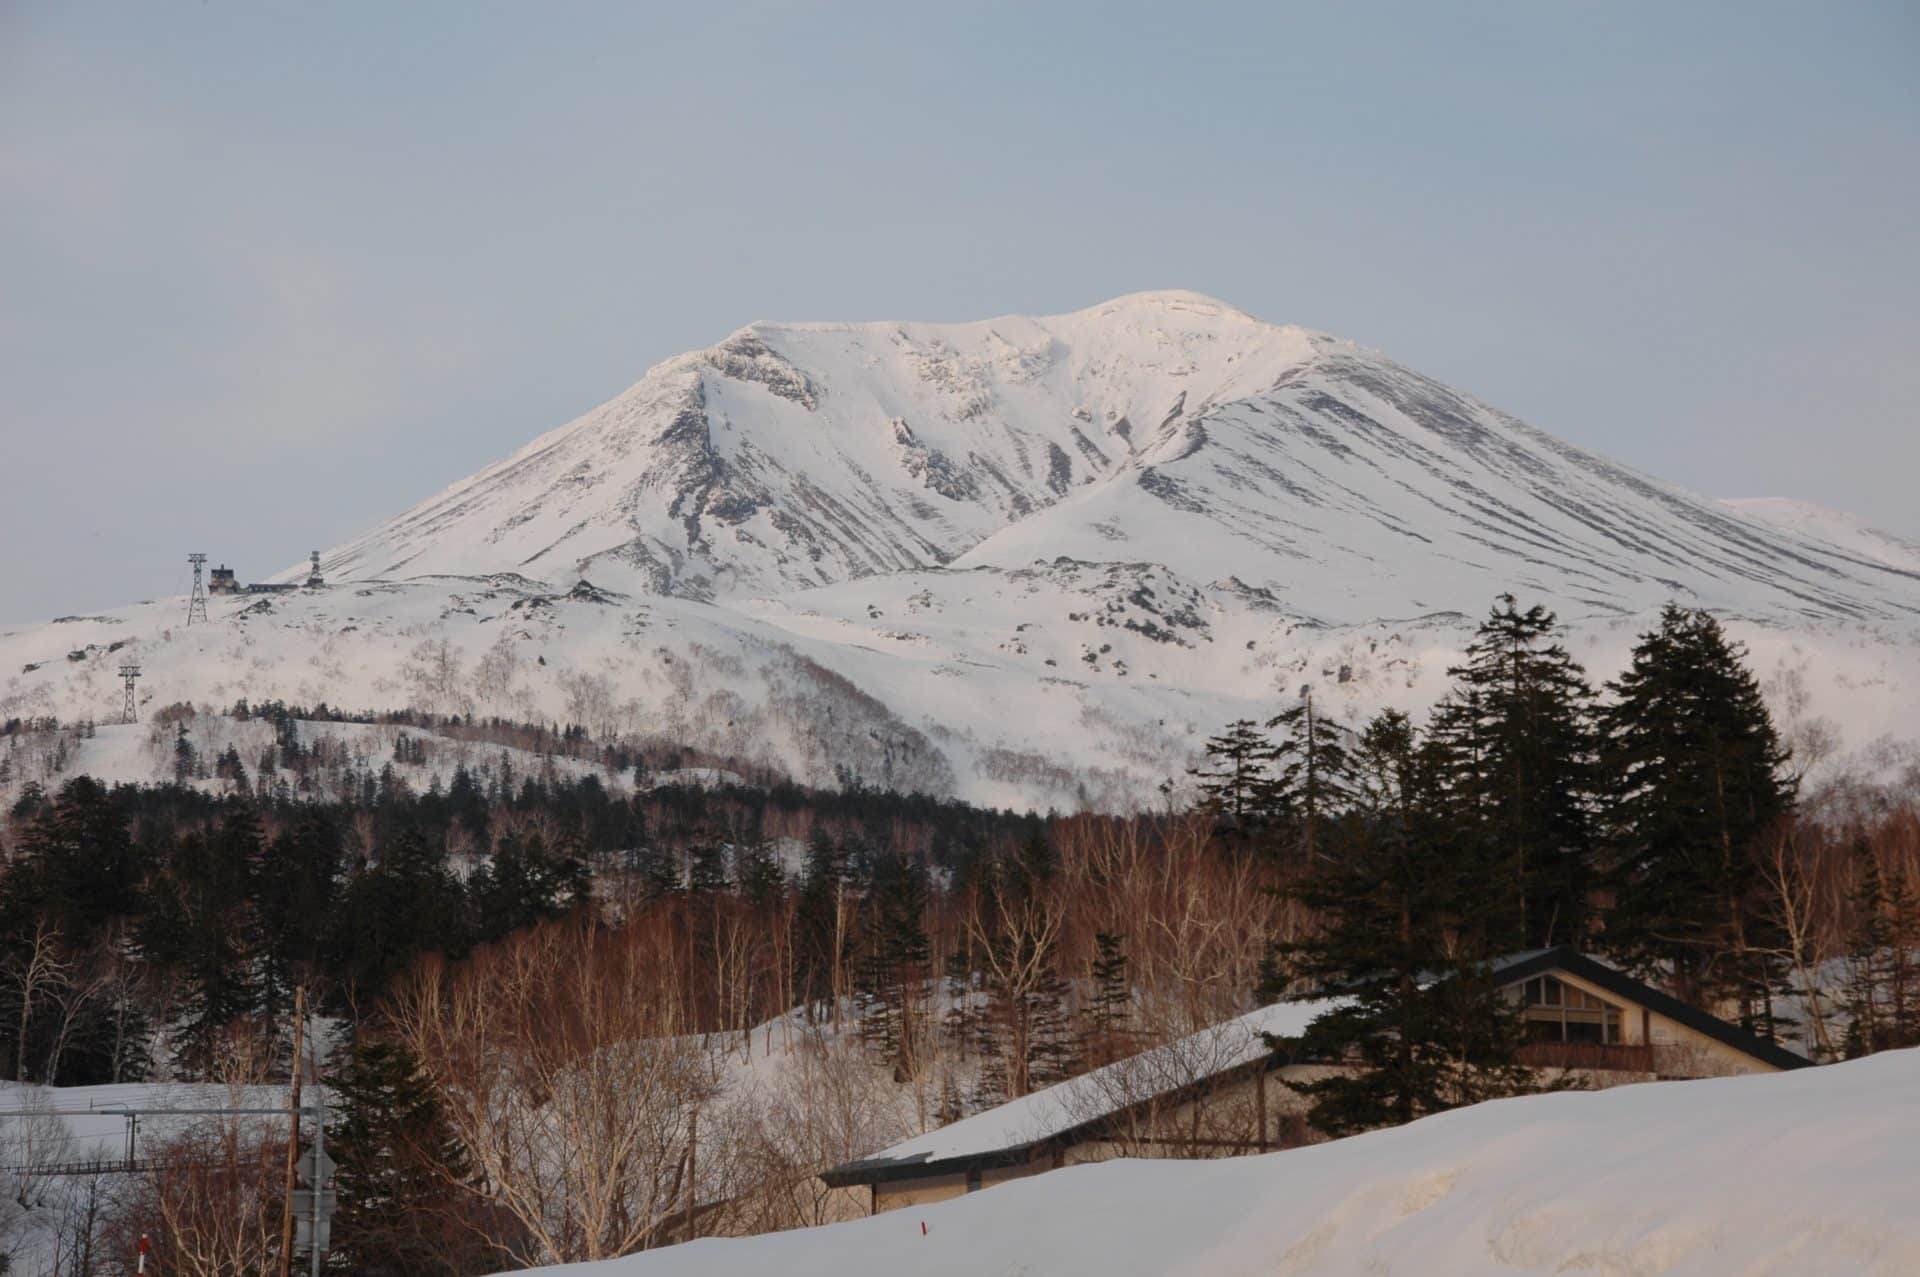 Hokkaido 9-day guided powder snowboarding